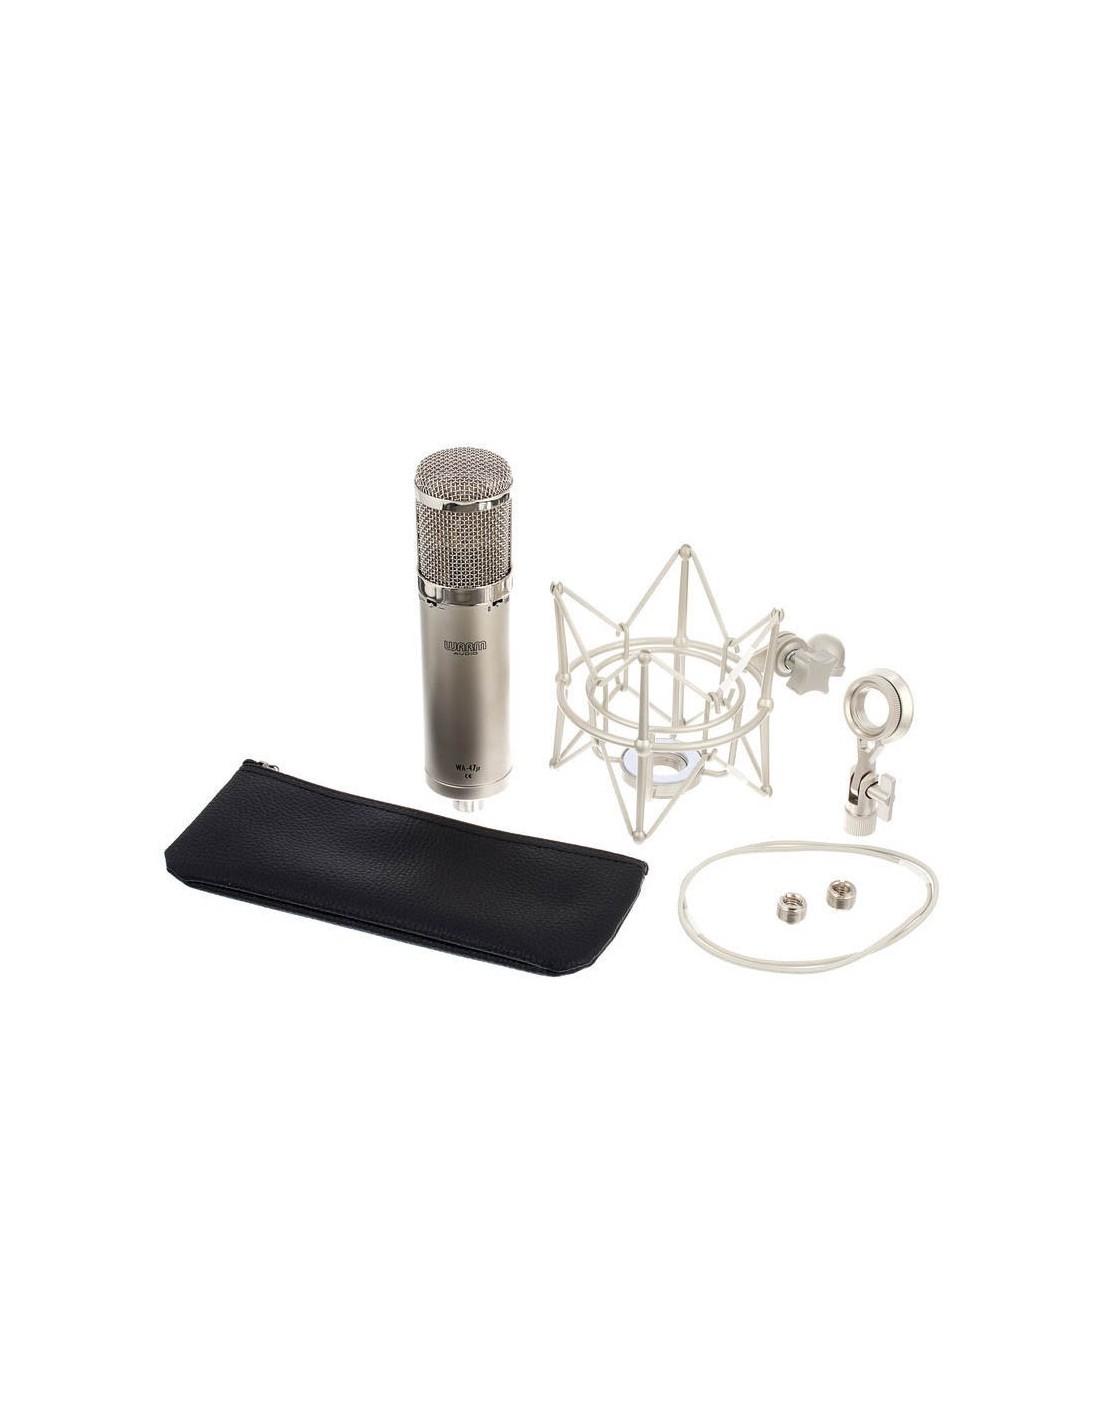 Microfono condensador WA47JR Warm Audio